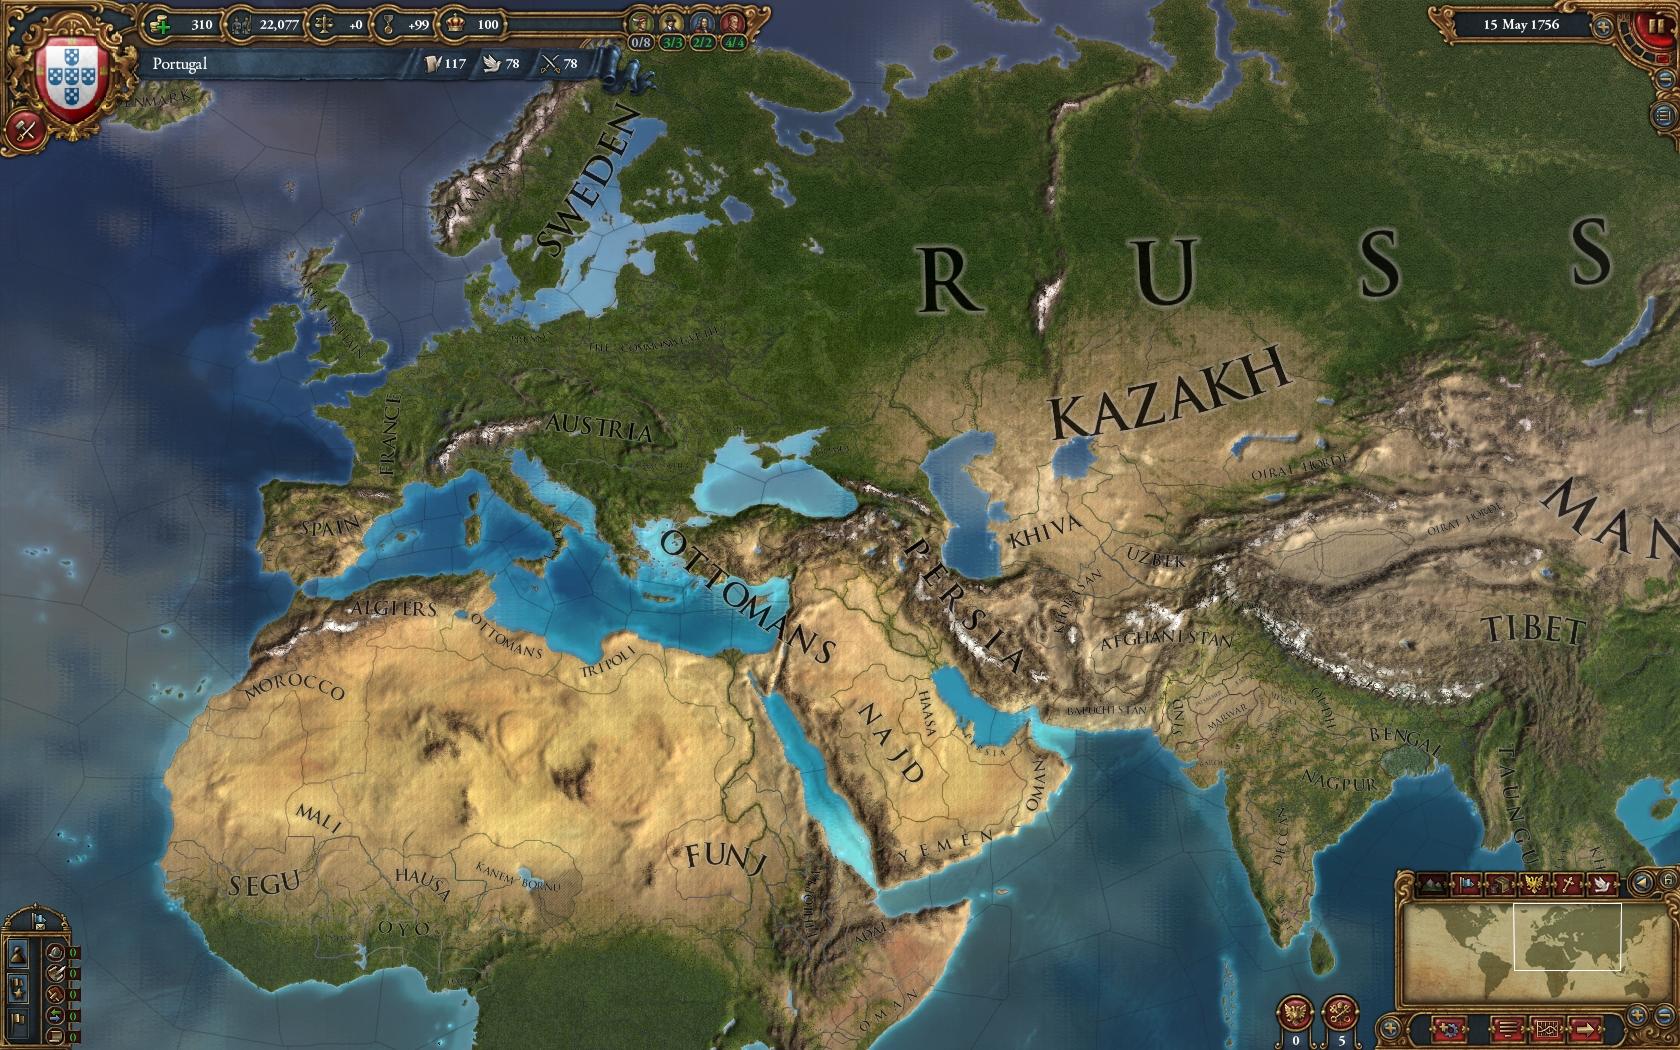 Europa Universalis IV Extreme Edition (NEW) | LATAM_RU-CIS_TR (13be7fe0-9810-4980-9e35-67ab96a7fac8)